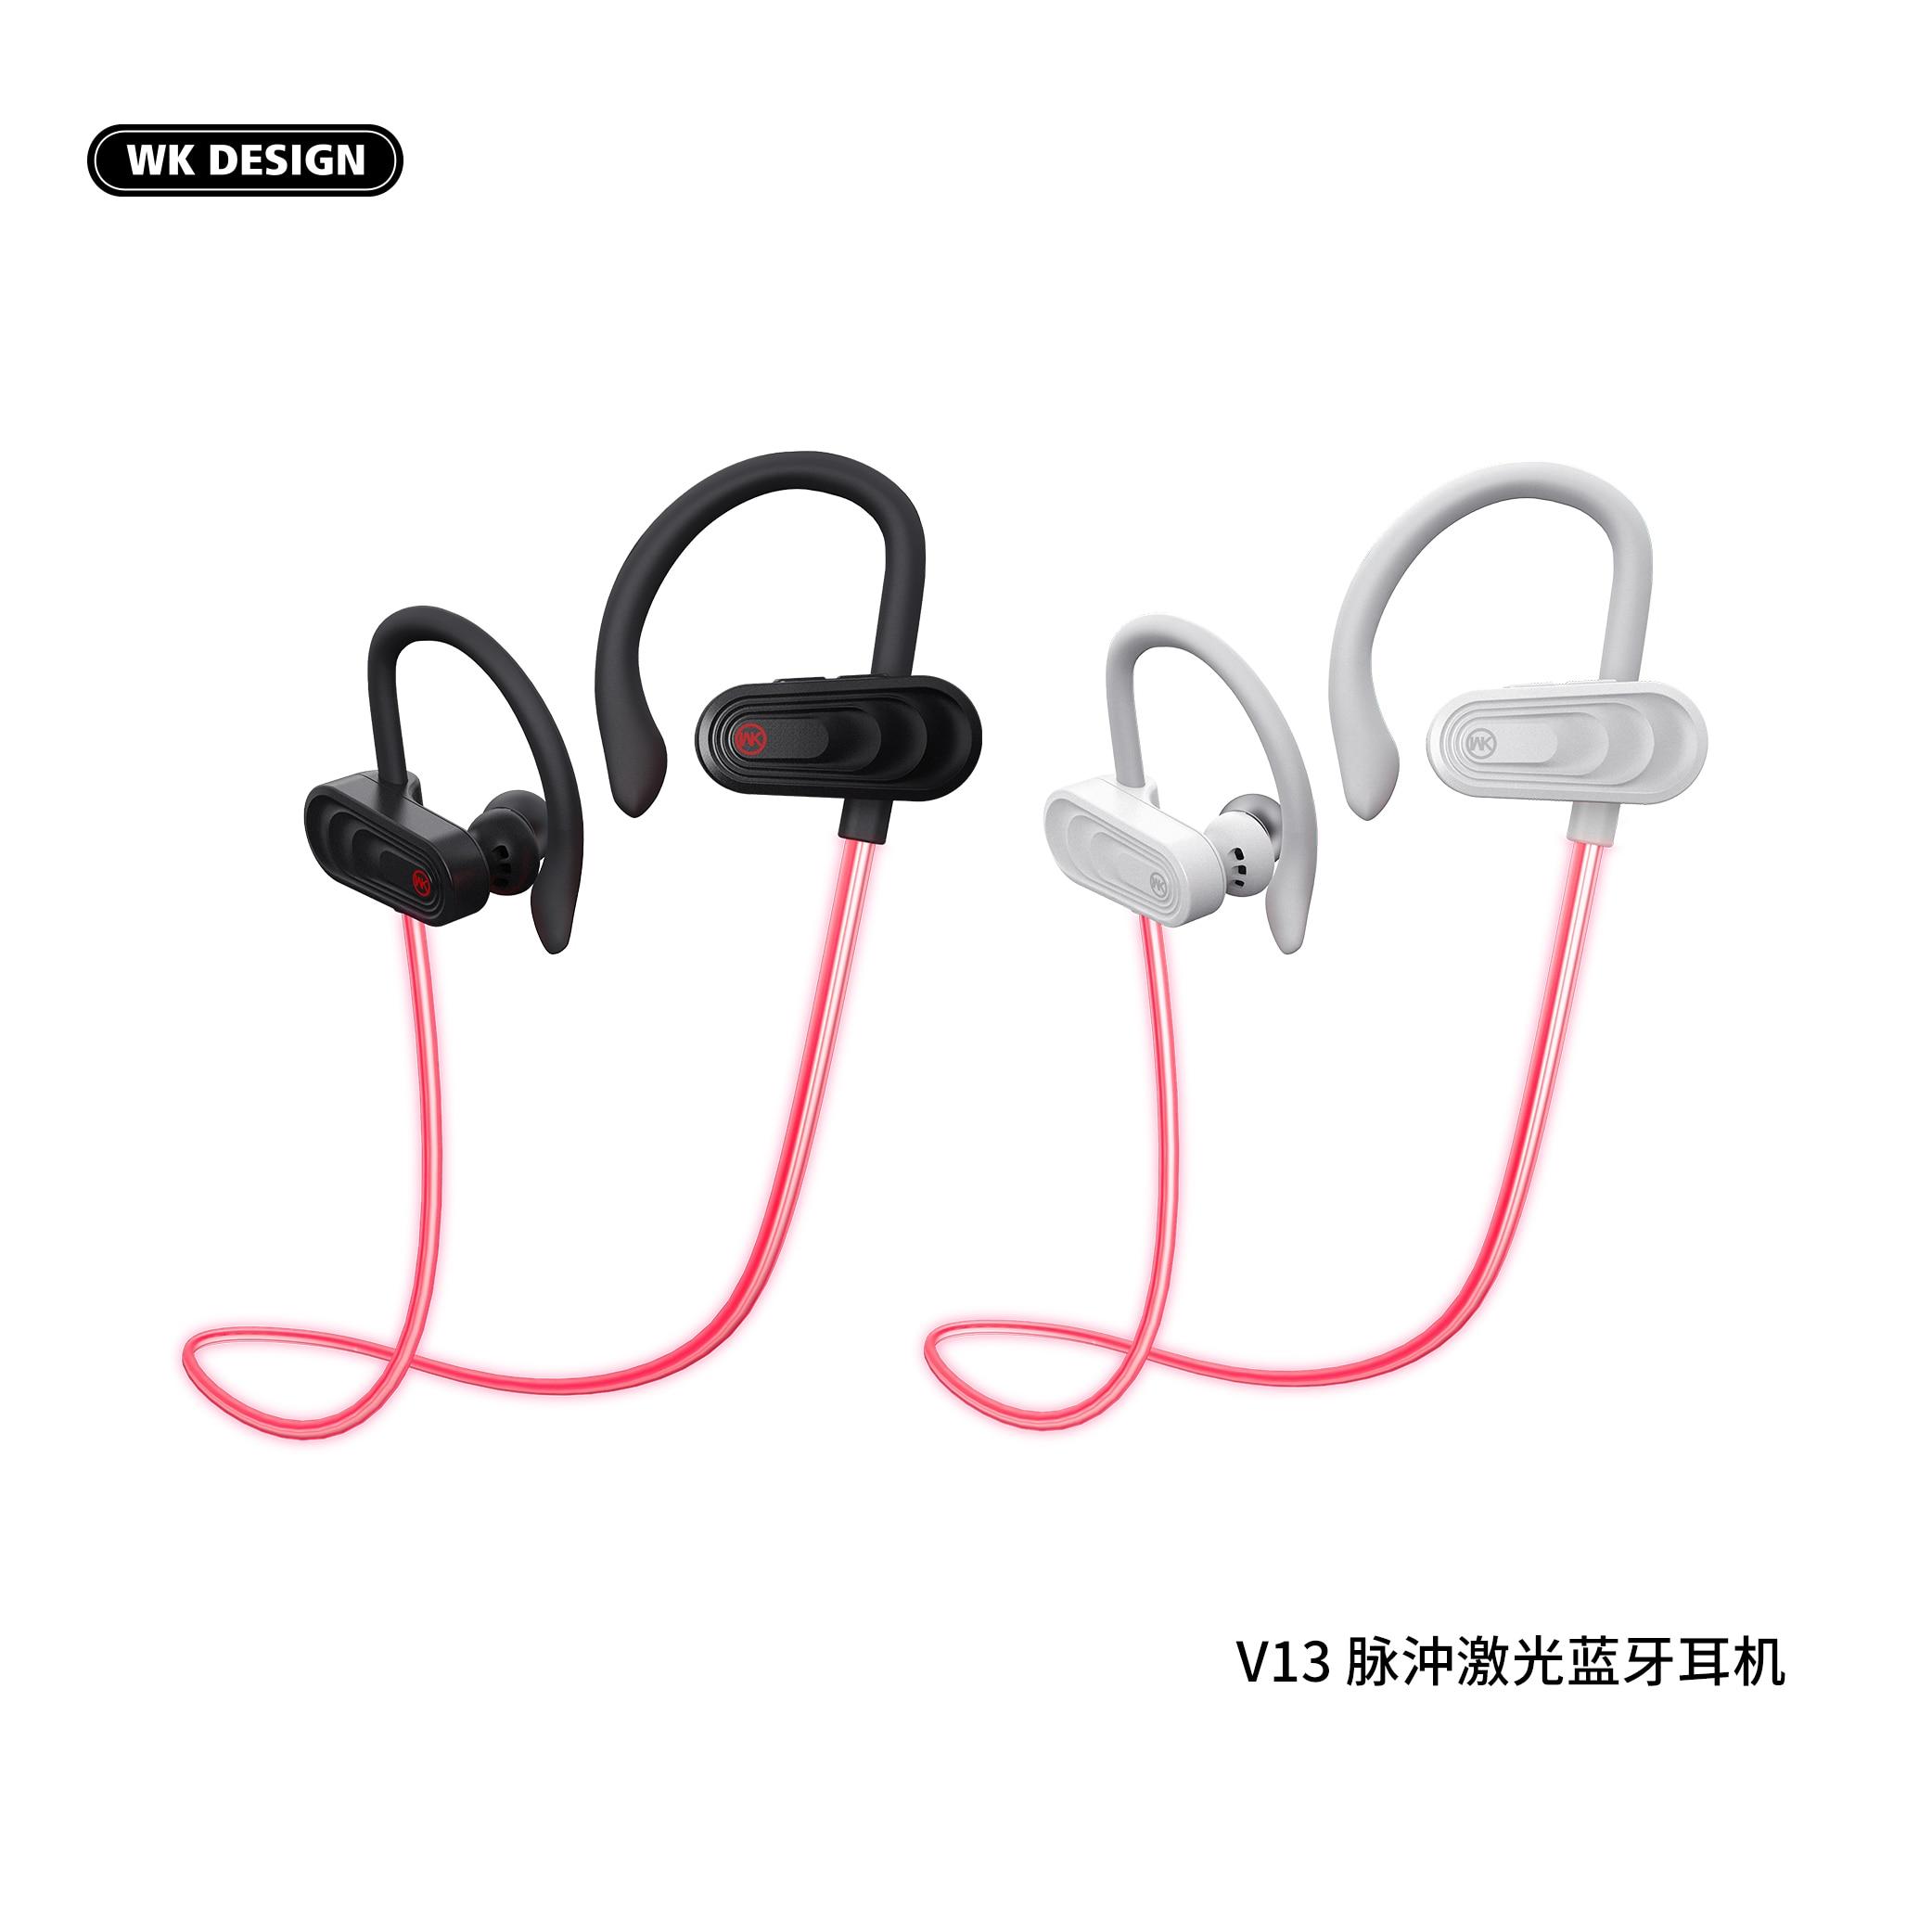 WK pulso láser Bluetooth 5,0 auriculares estéreo inalámbrico deporte